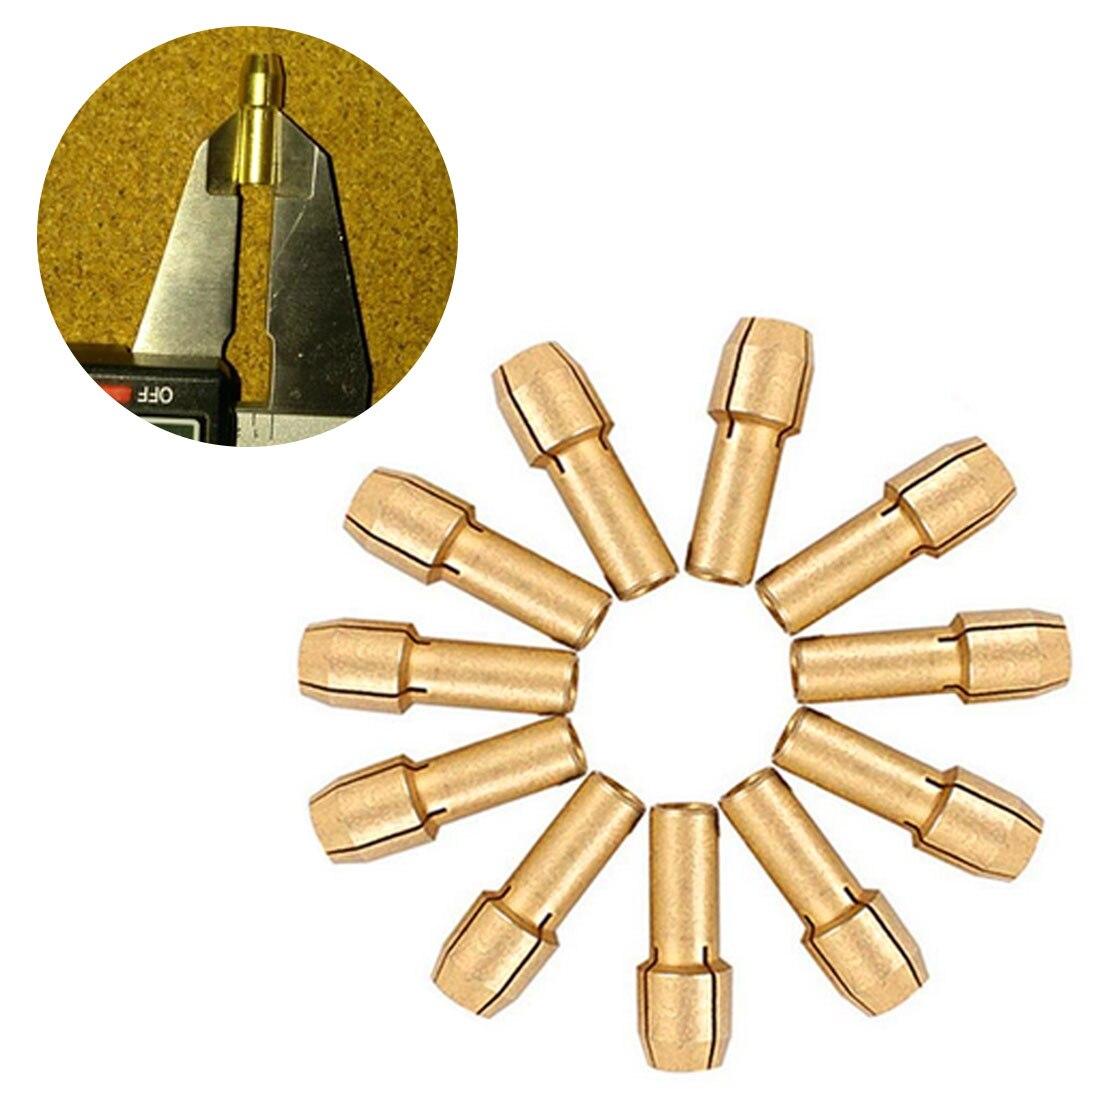 4mm Shank Diameter 11pcs Brass Drill Chucks Collet Bits 0.5-3.2mm For Dremel Rotary Tool